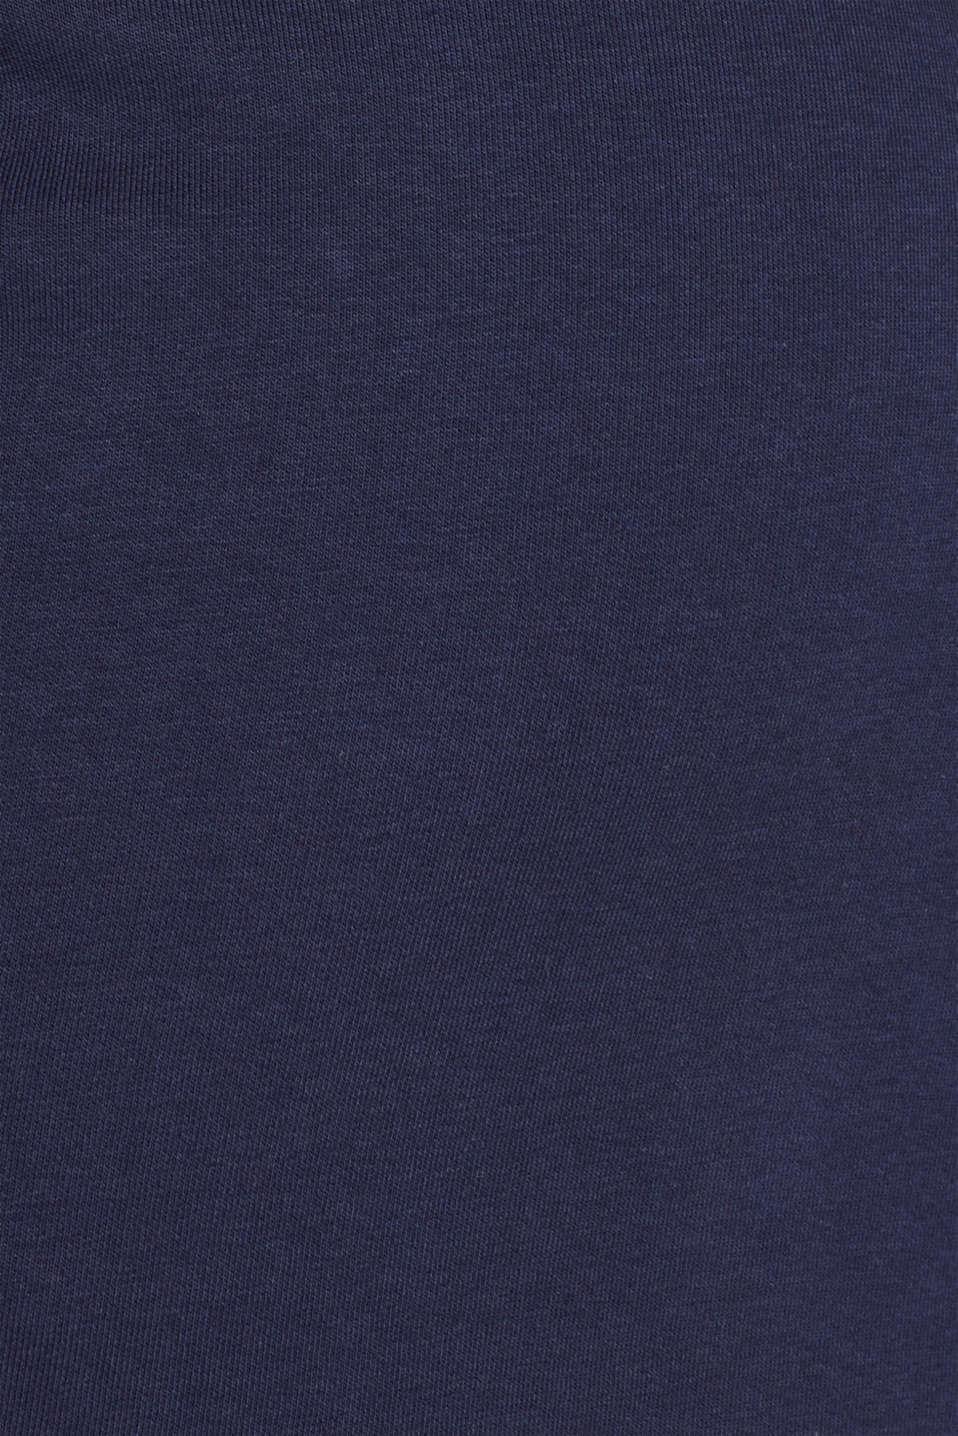 Sweatshirt skirt with racing stripes, NAVY, detail image number 4